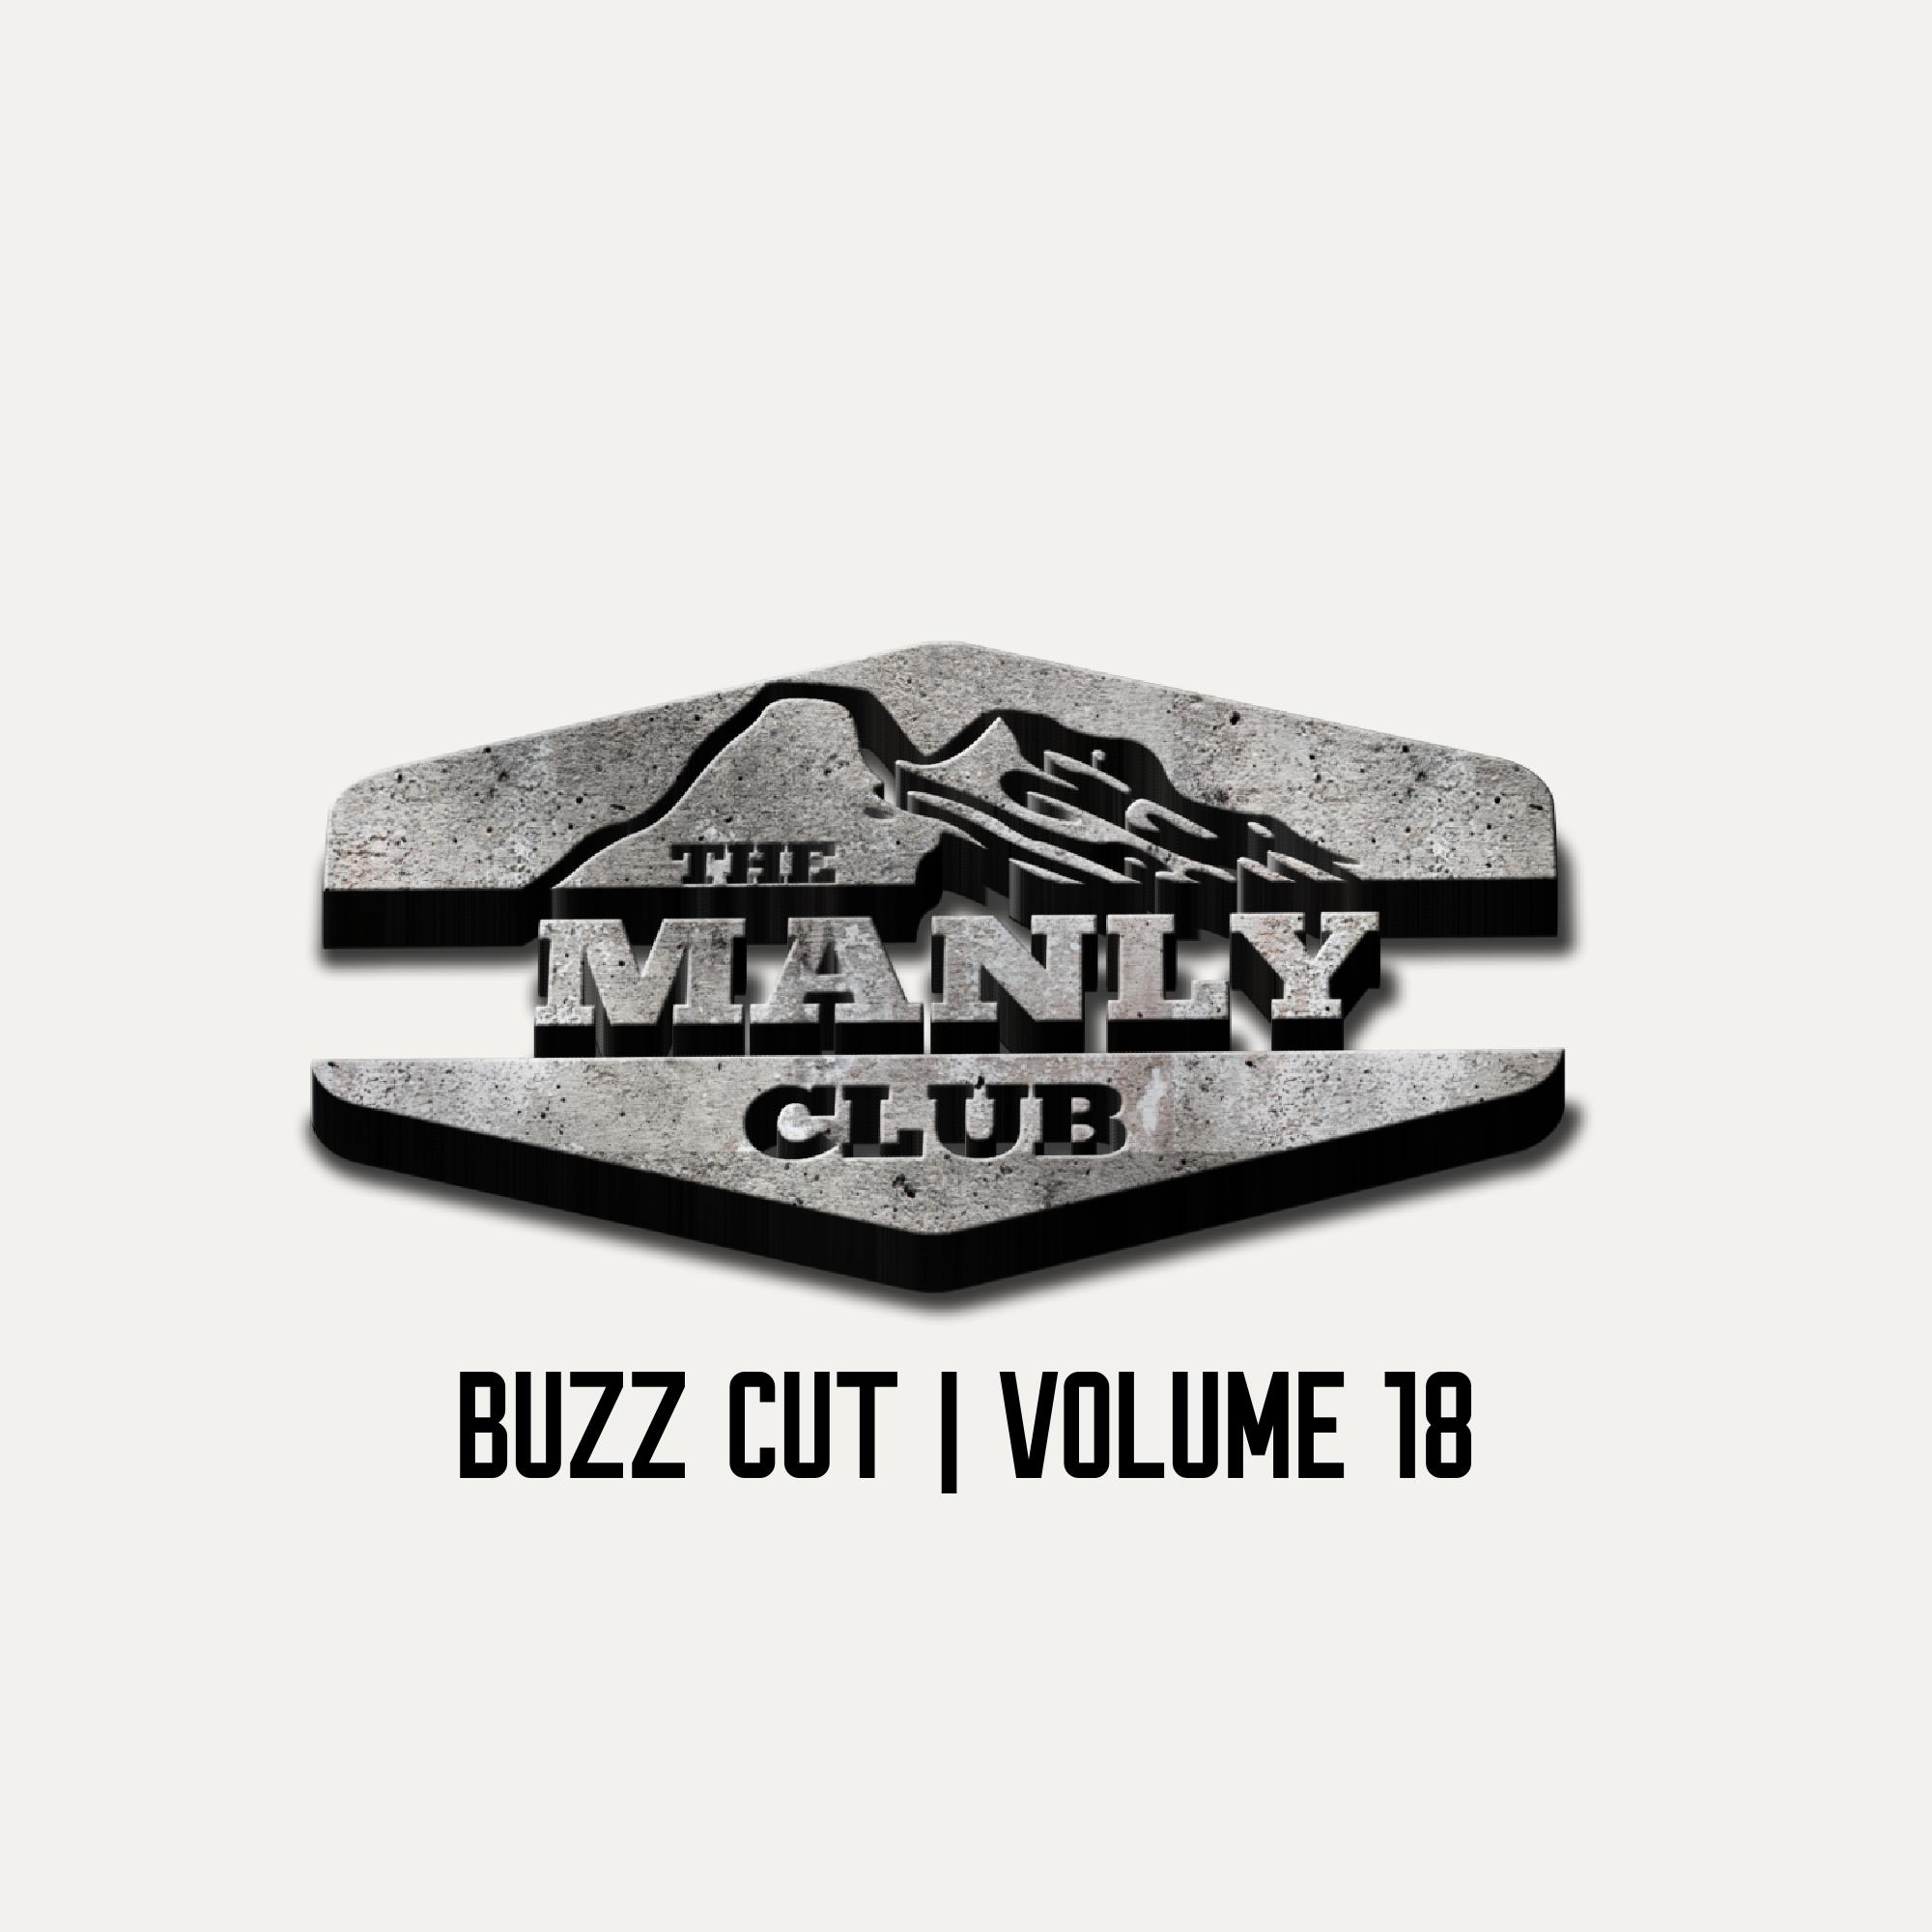 the manly club buzz cut volume 18